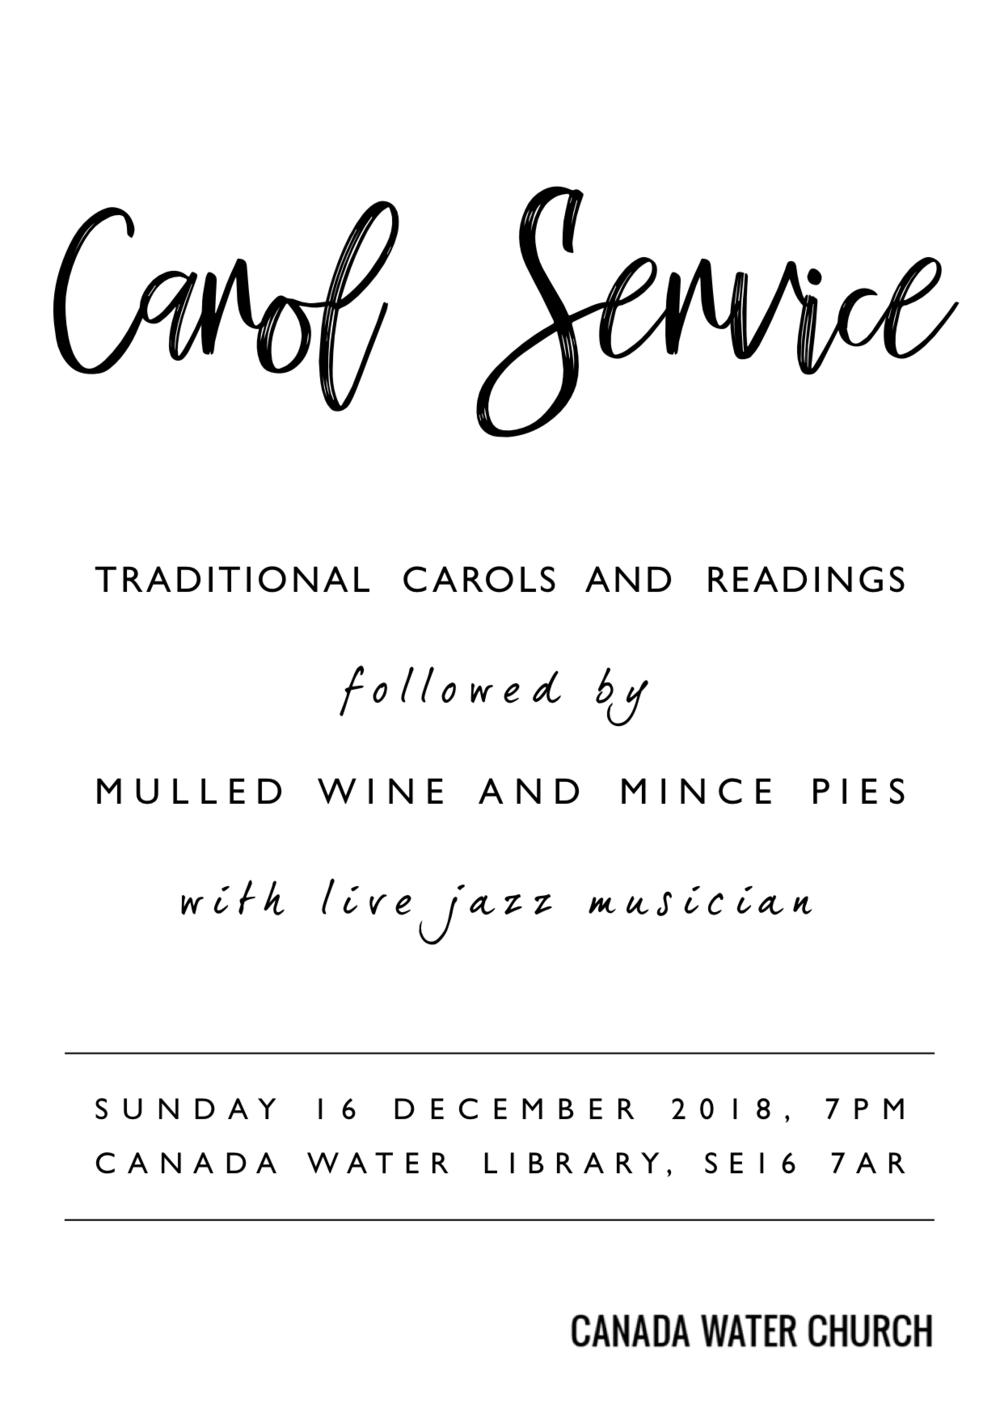 Carol service evening.png